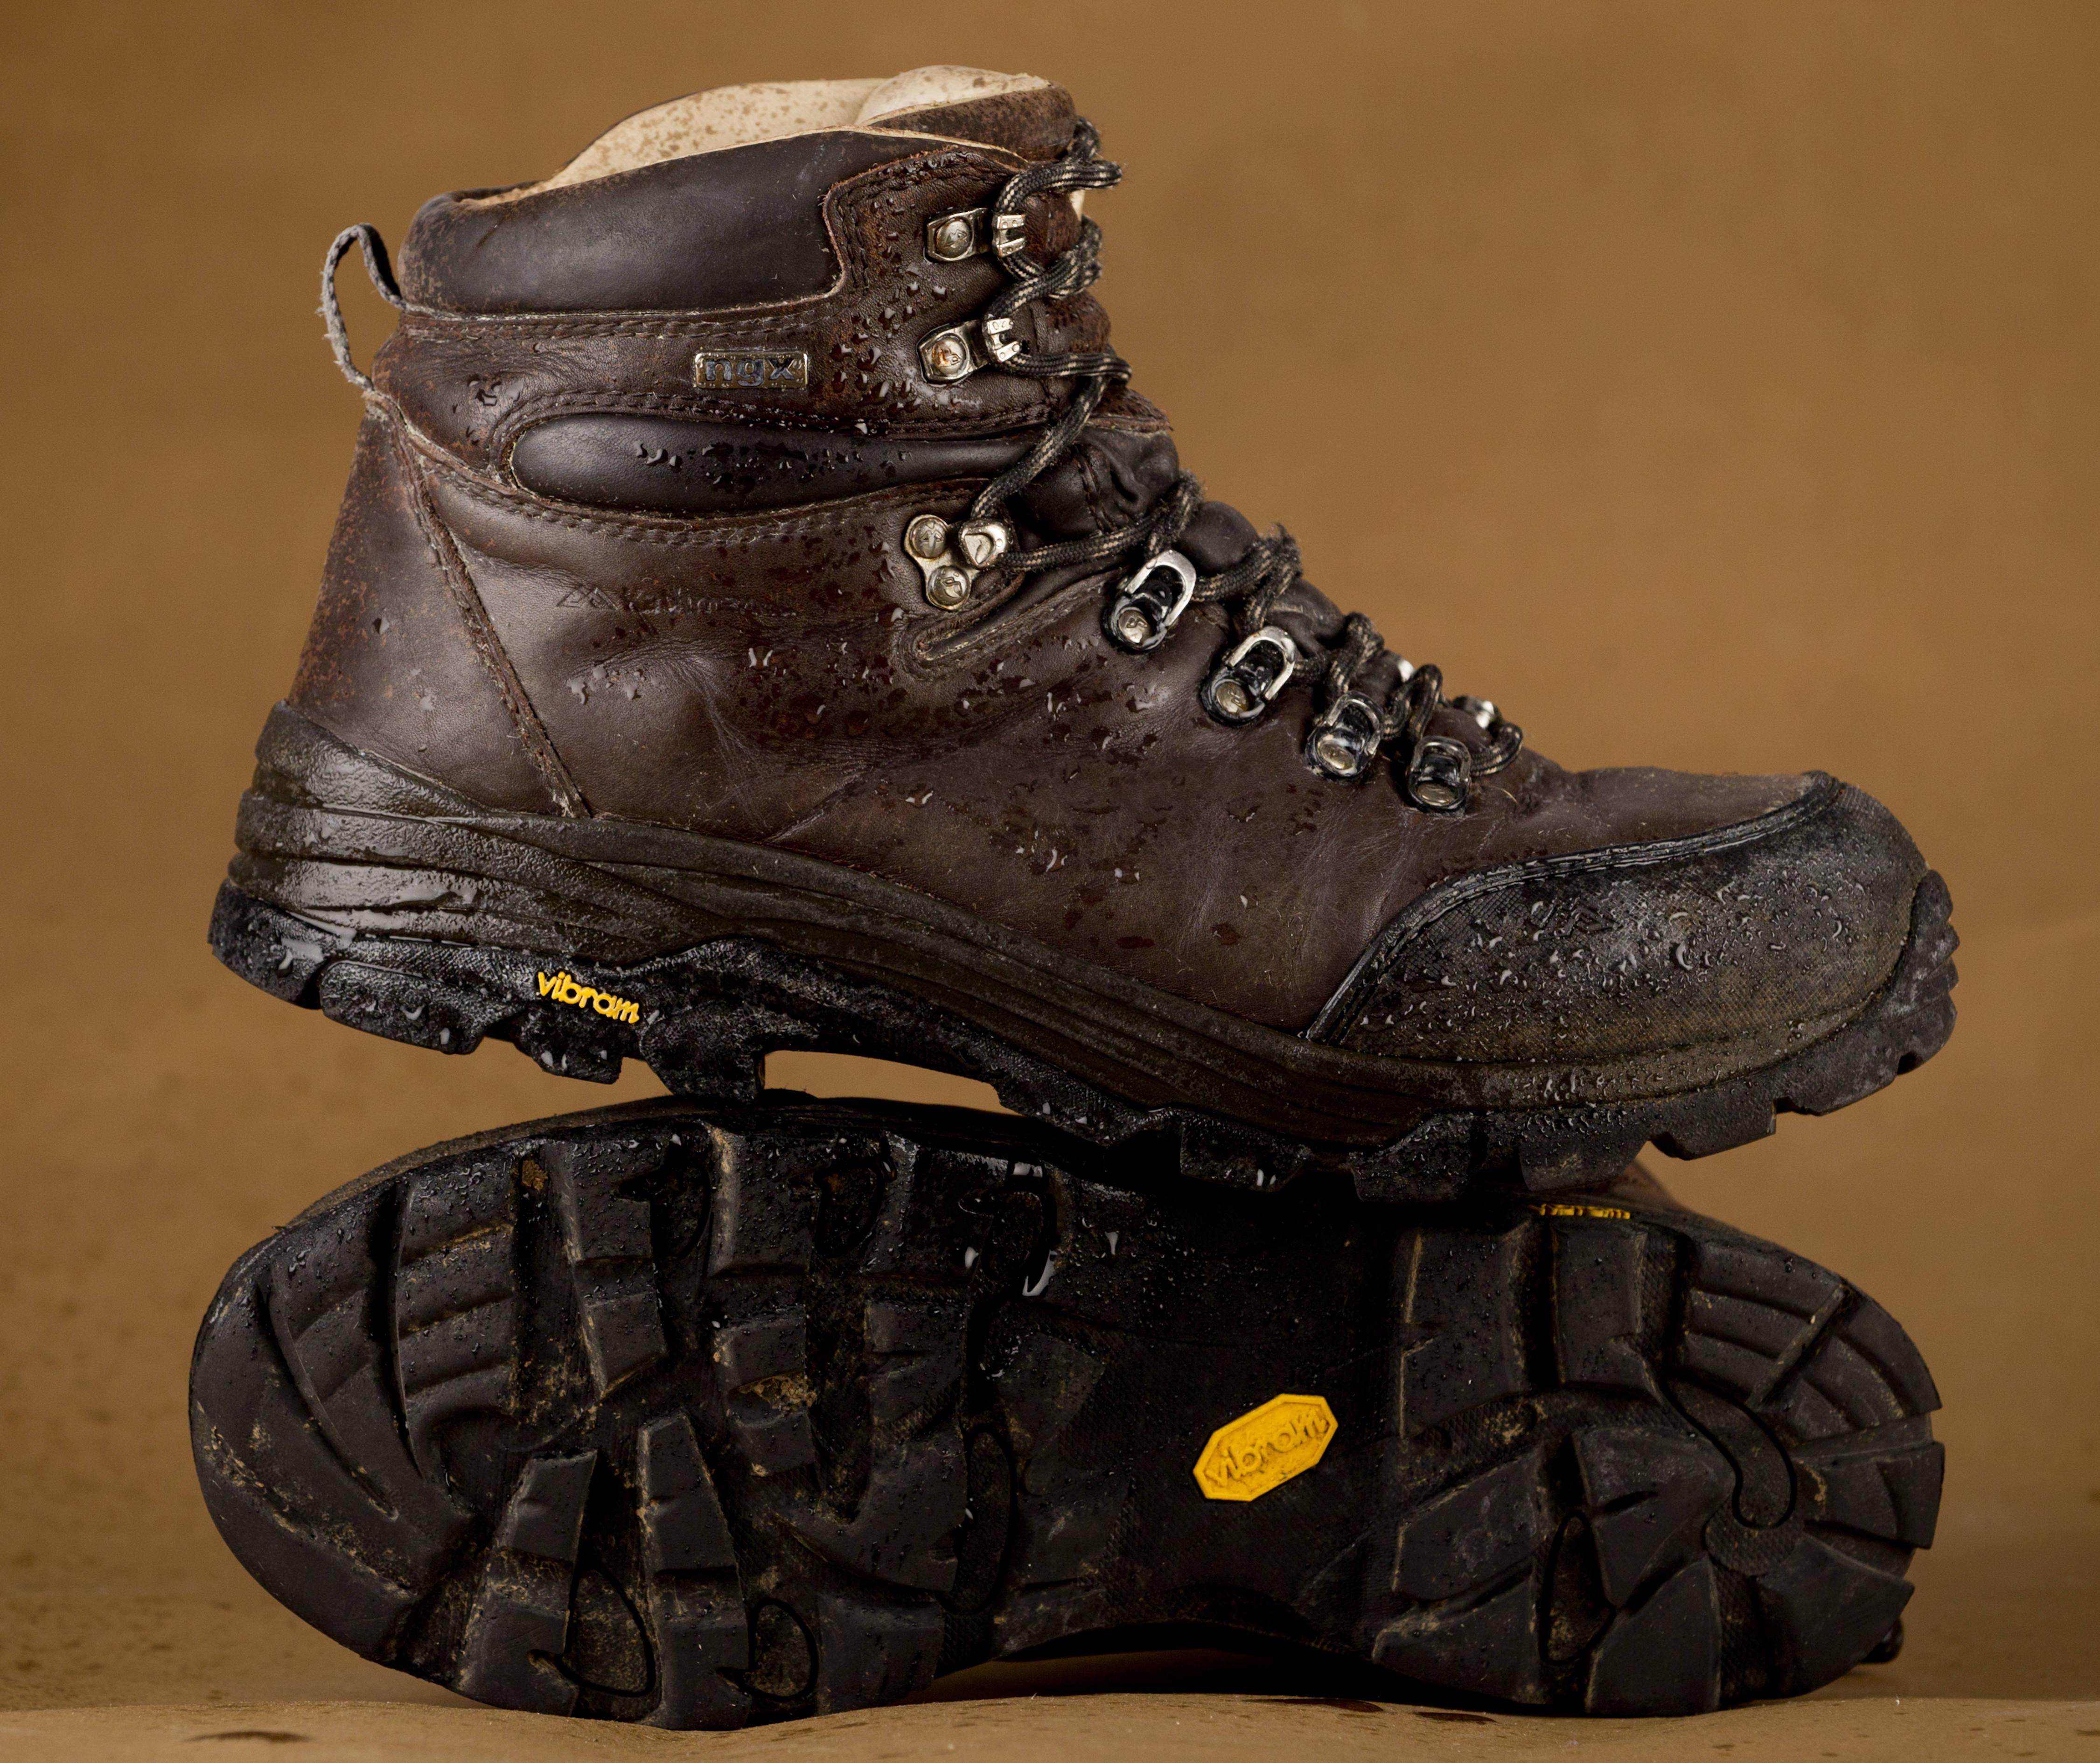 9dad5ab3cf7 Travel kit review: Kathmandu Tiber NGX Boots - NZ Herald